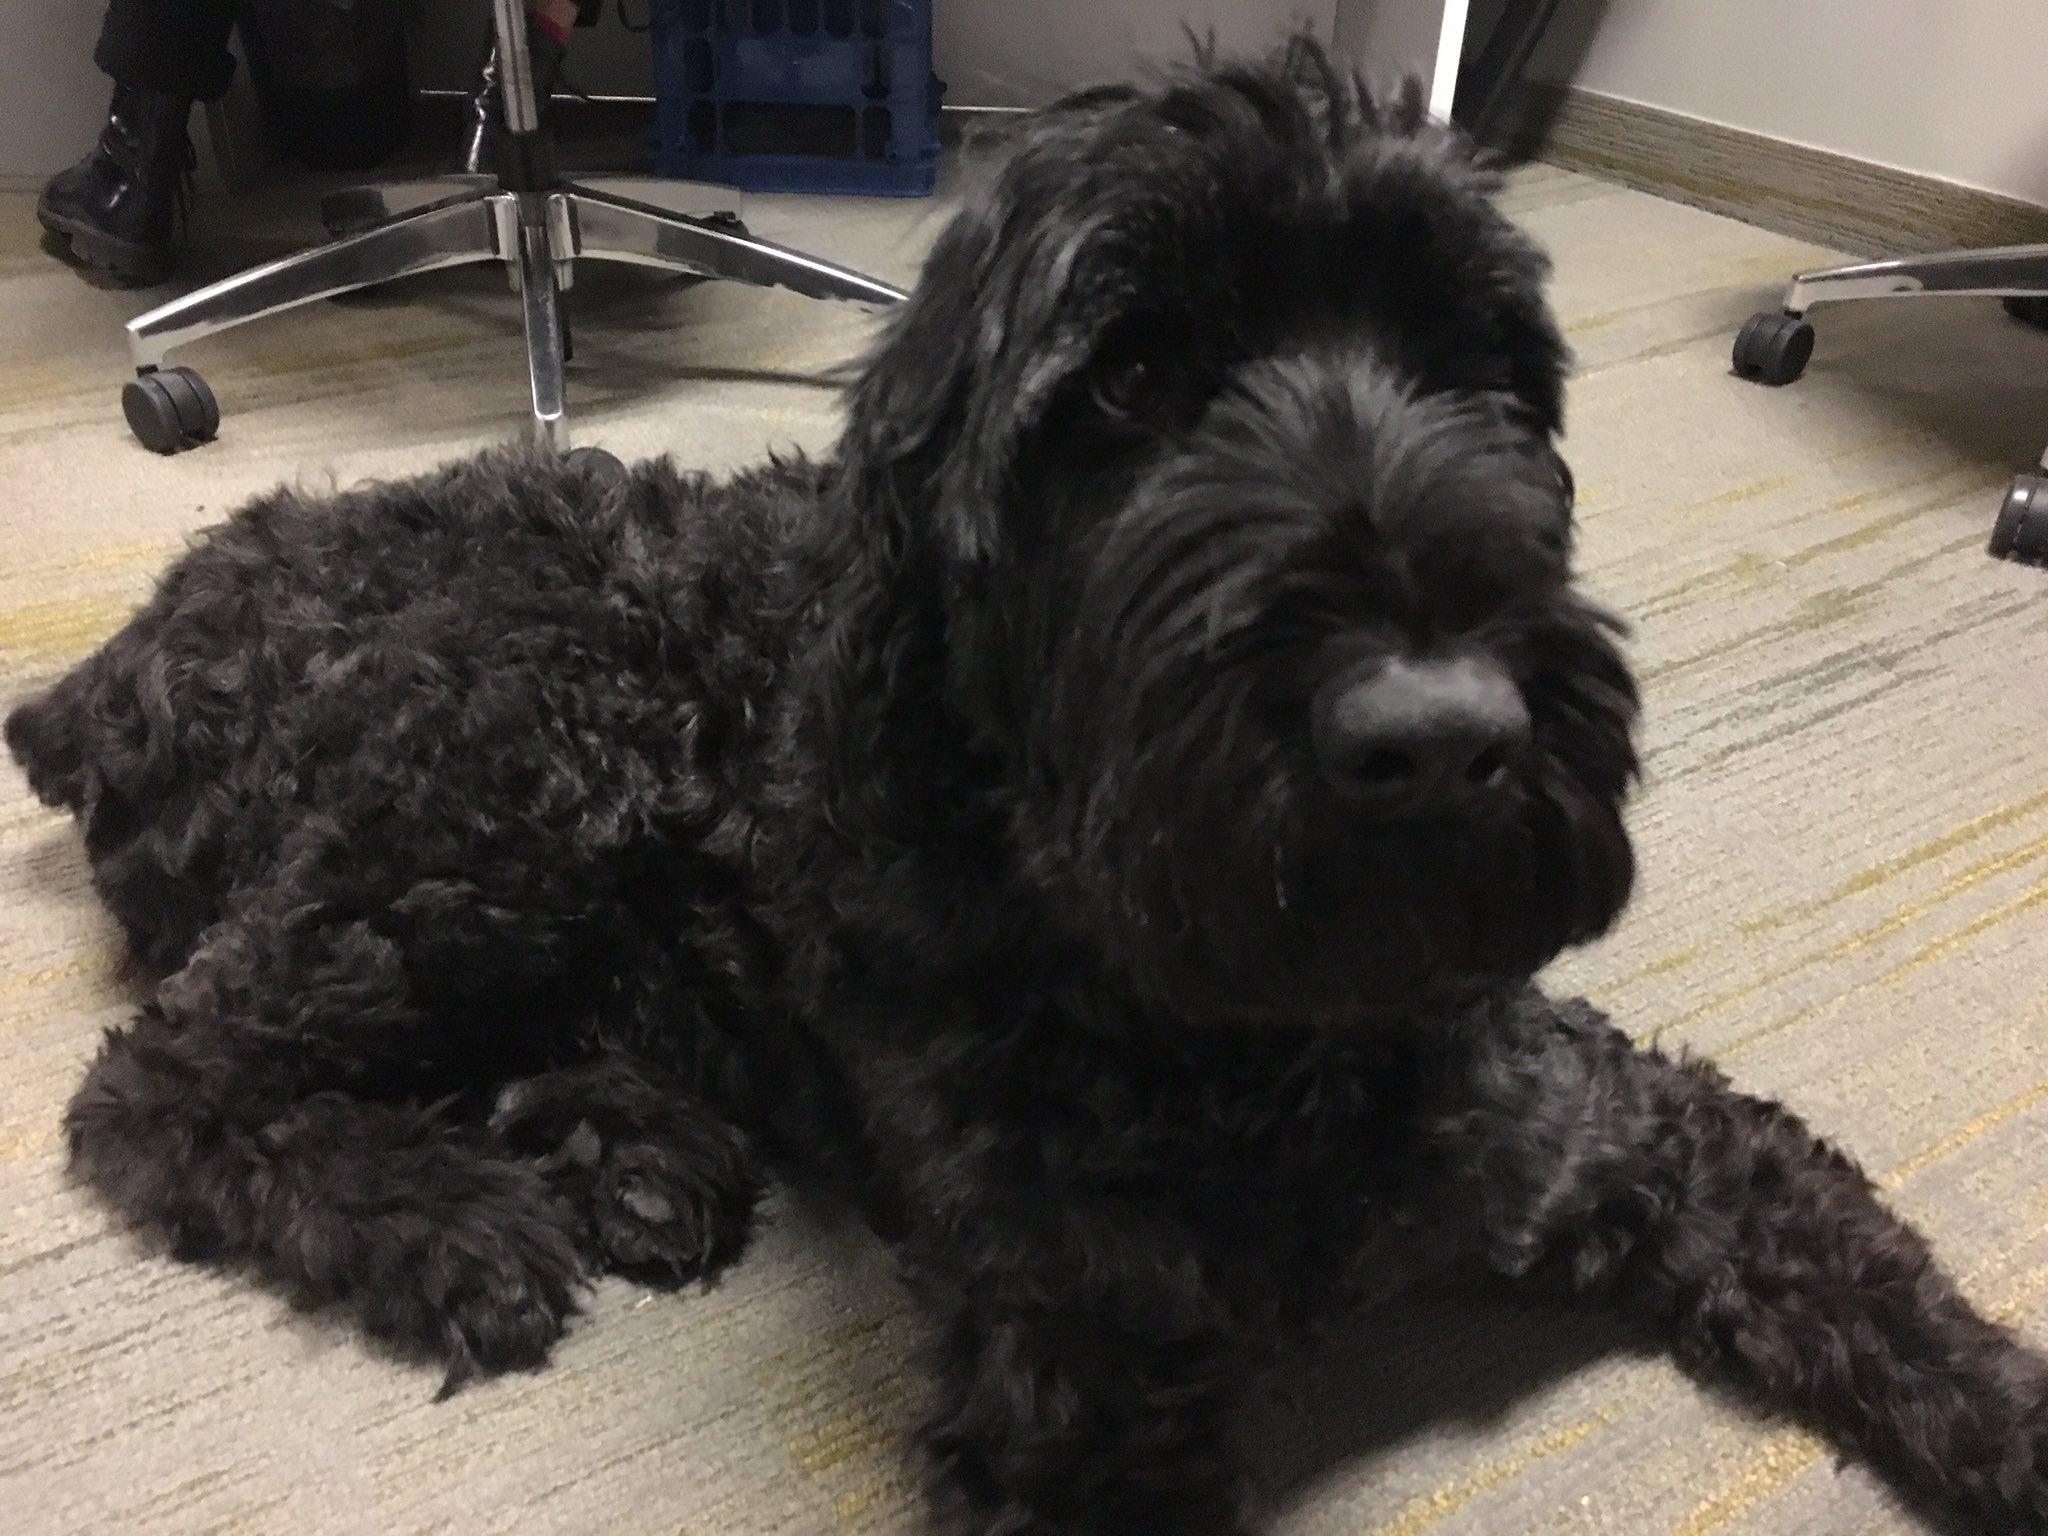 Friendly visitor today at #CodeAcrossTO #dogswhocode #OpenDataDay https://t.co/SAoYLnpKZC